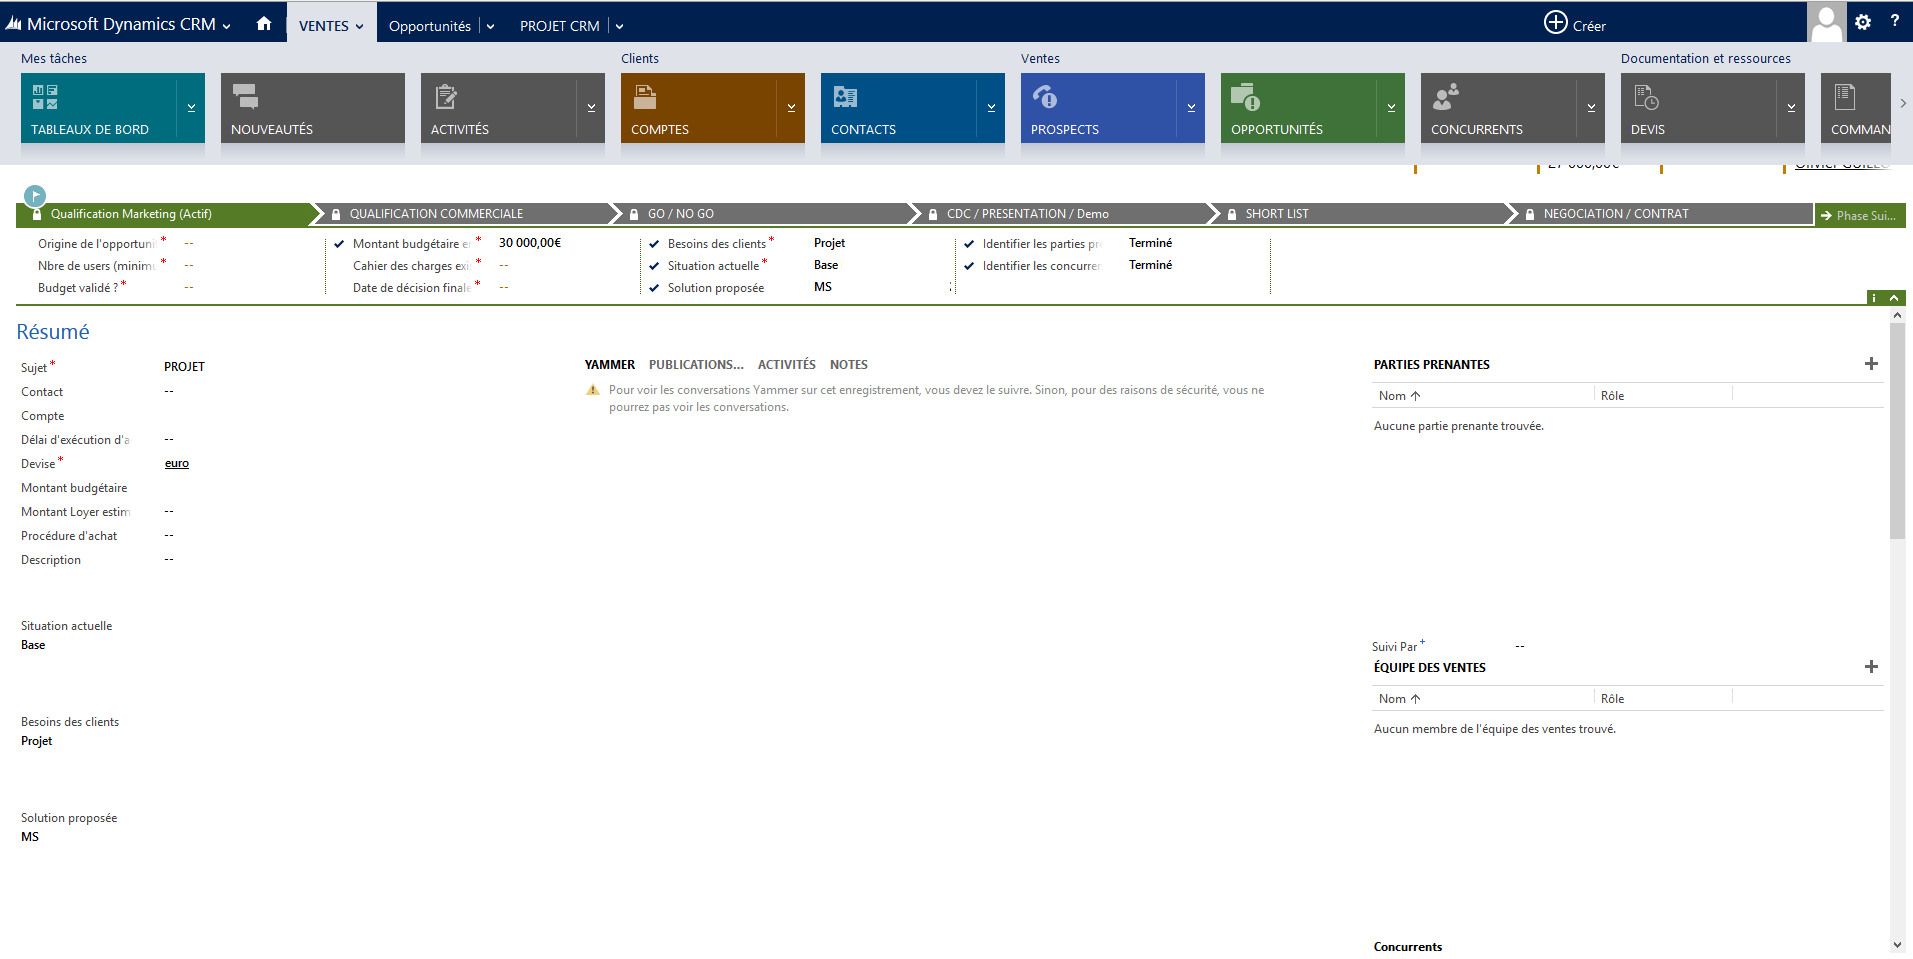 Microsoft Dynamics CRM: Acordo de Nível de Serviço (SLA), Telefone, Mobile Application